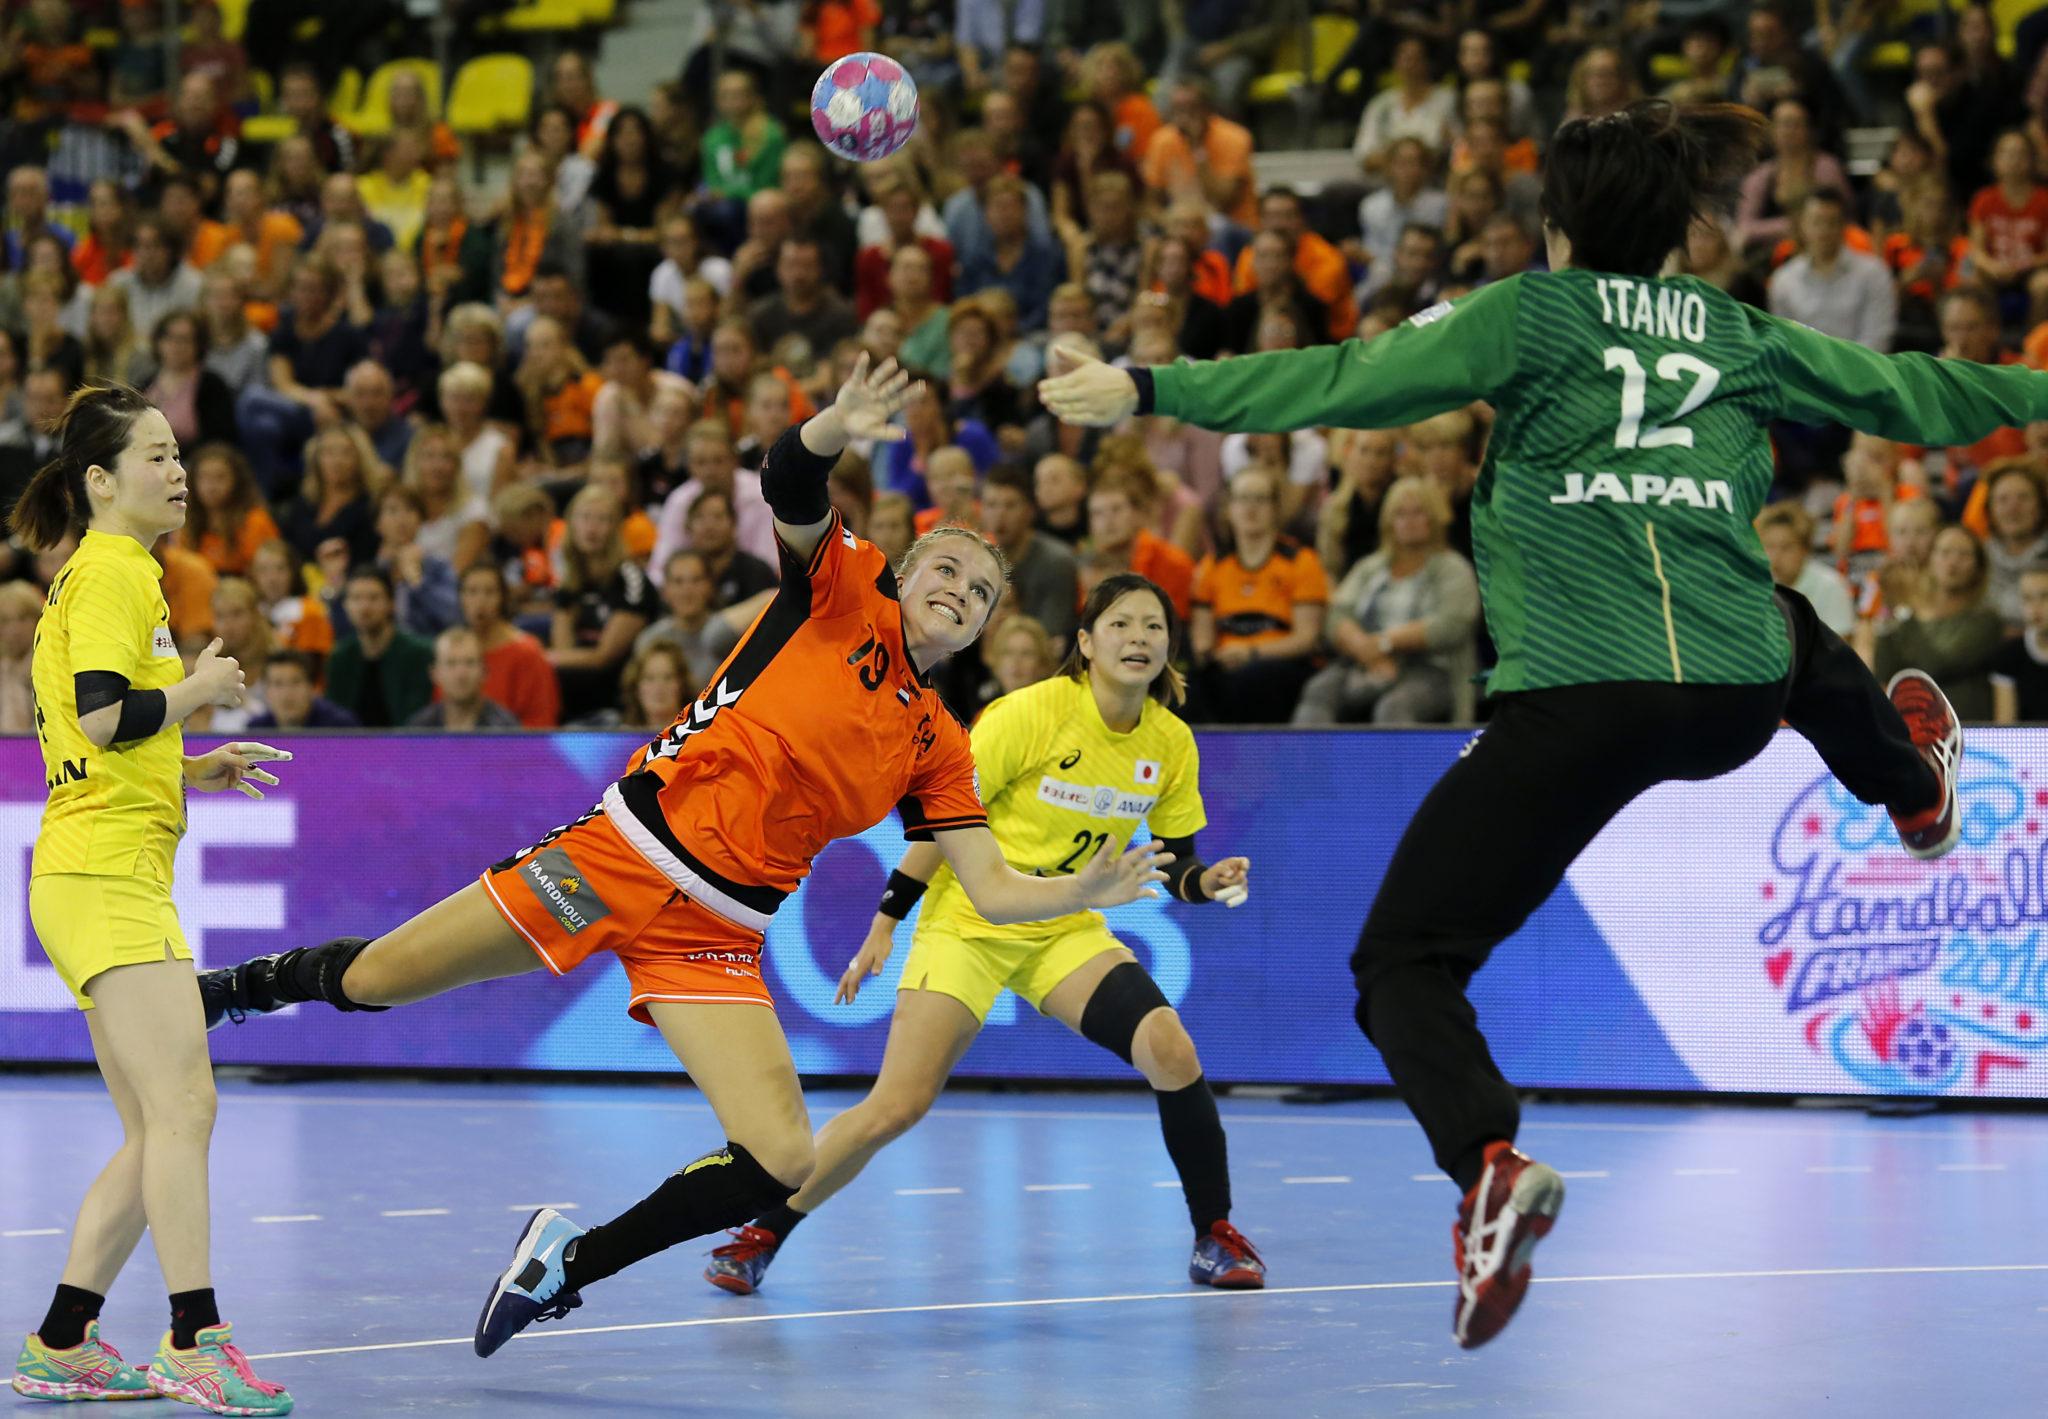 28 September 2018: Handbal: Oefeninterland: Nederland-Japan: Eindhoven   Foto: Edwin Verheul